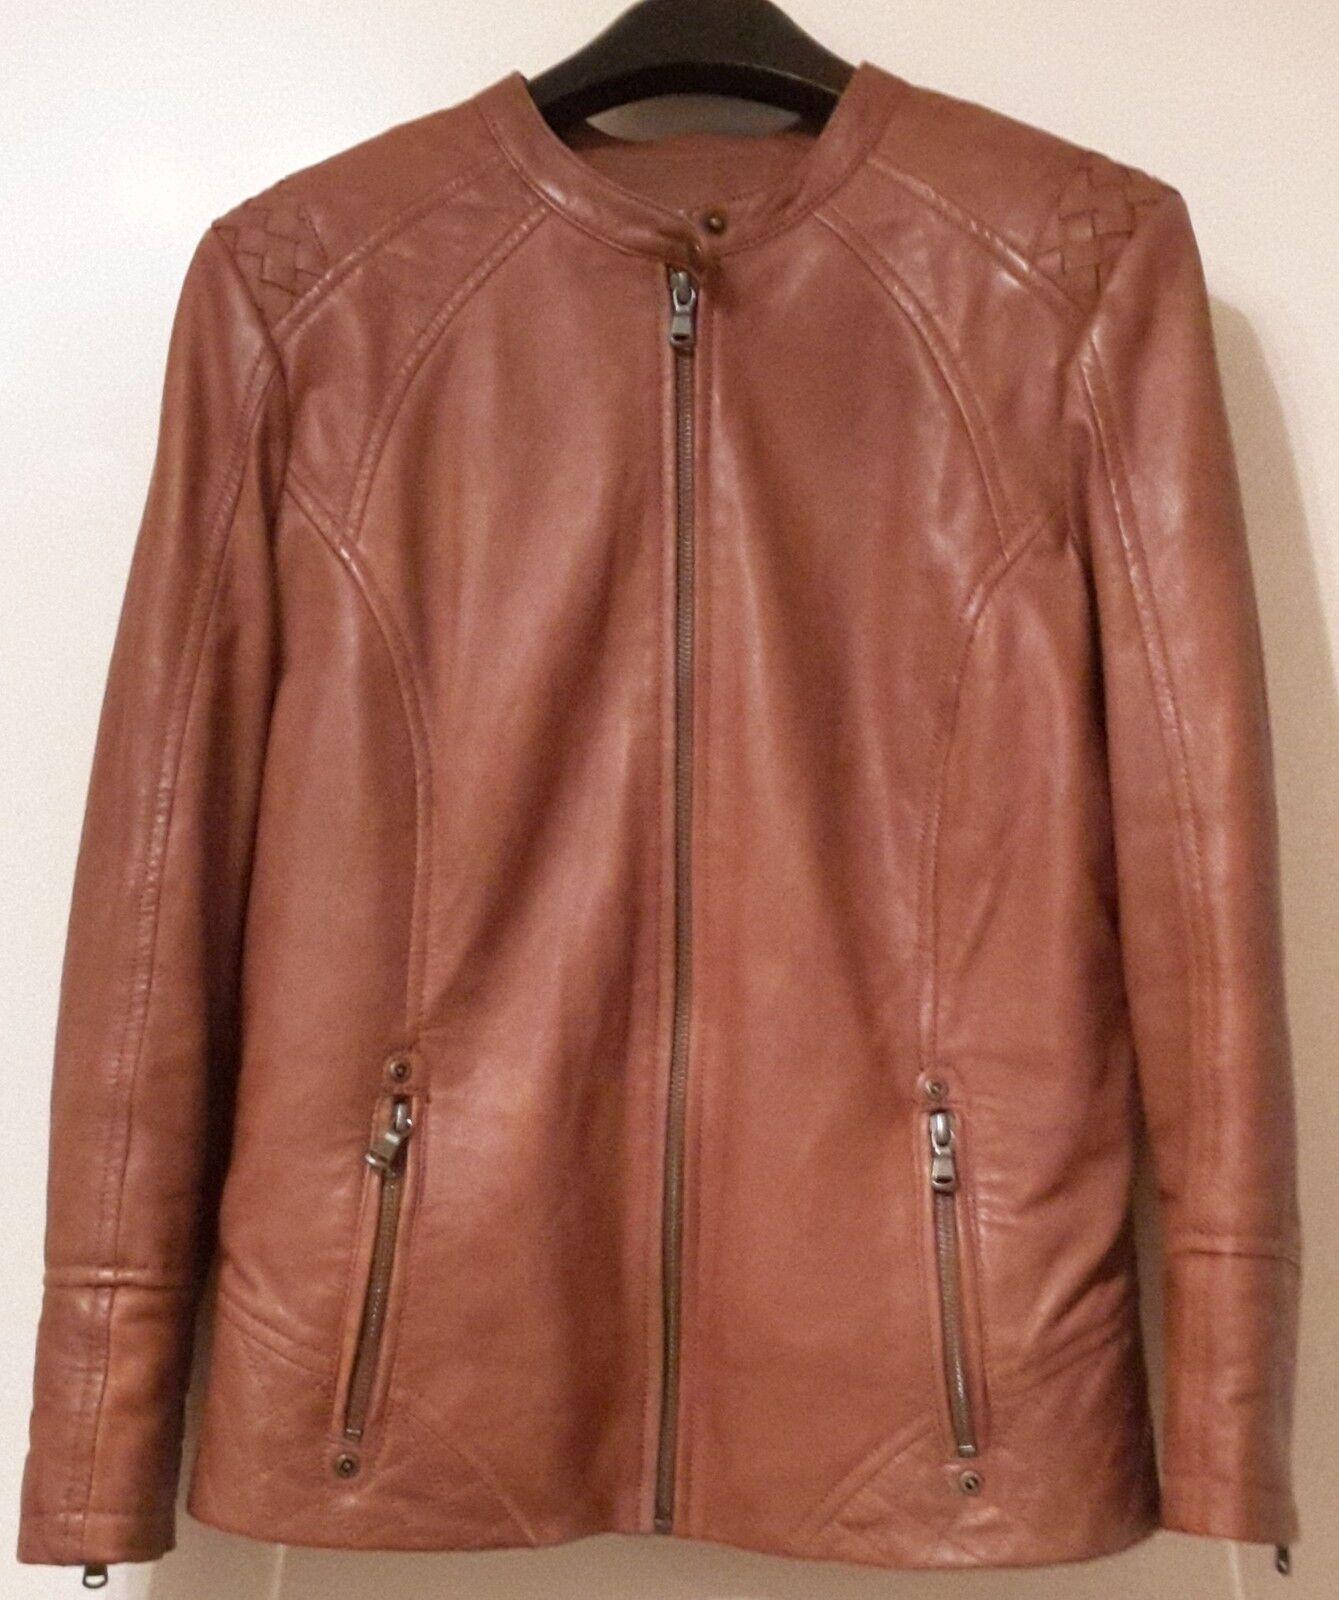 2be1fa858f6fcd Lederjacke Jacke Damenjacke Echtleder Leder gesteppt Gr. S PROMOD  Stehkragen nzacpg1851-neue Kleidung